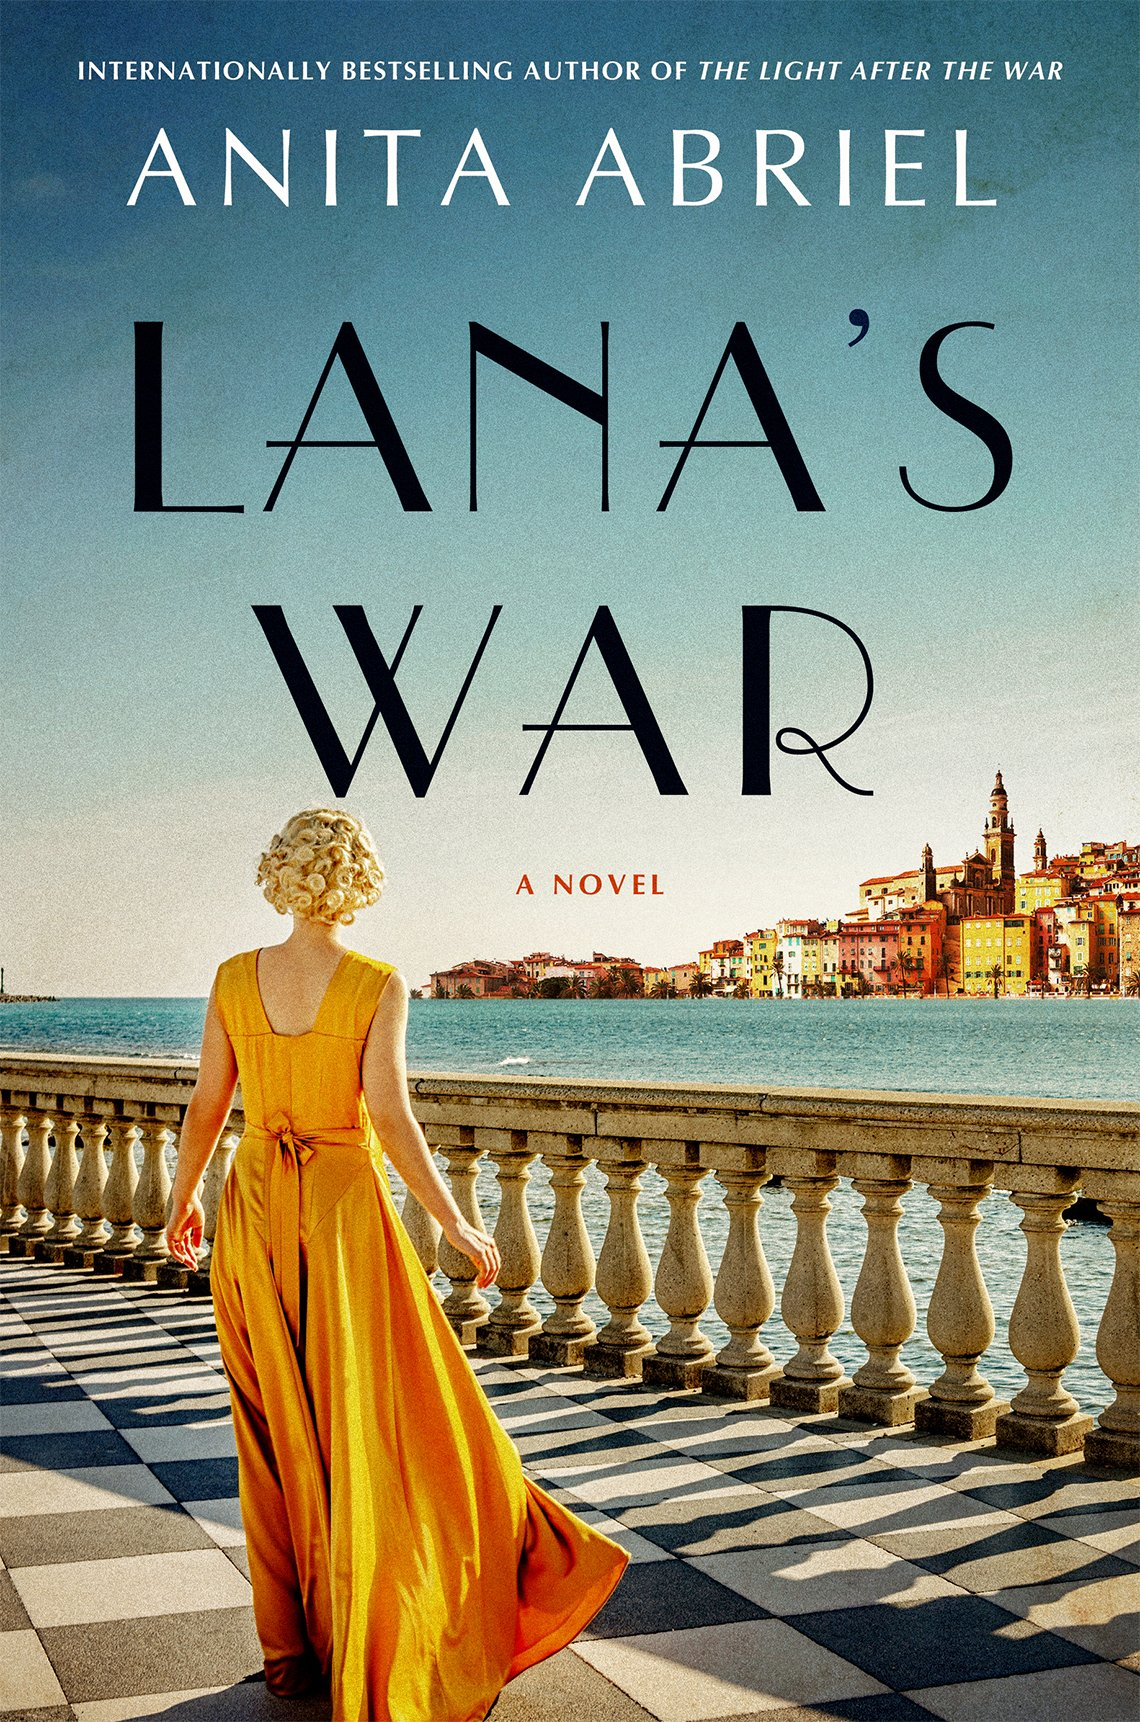 Portada del libro Lana's War de Anita Abriel.